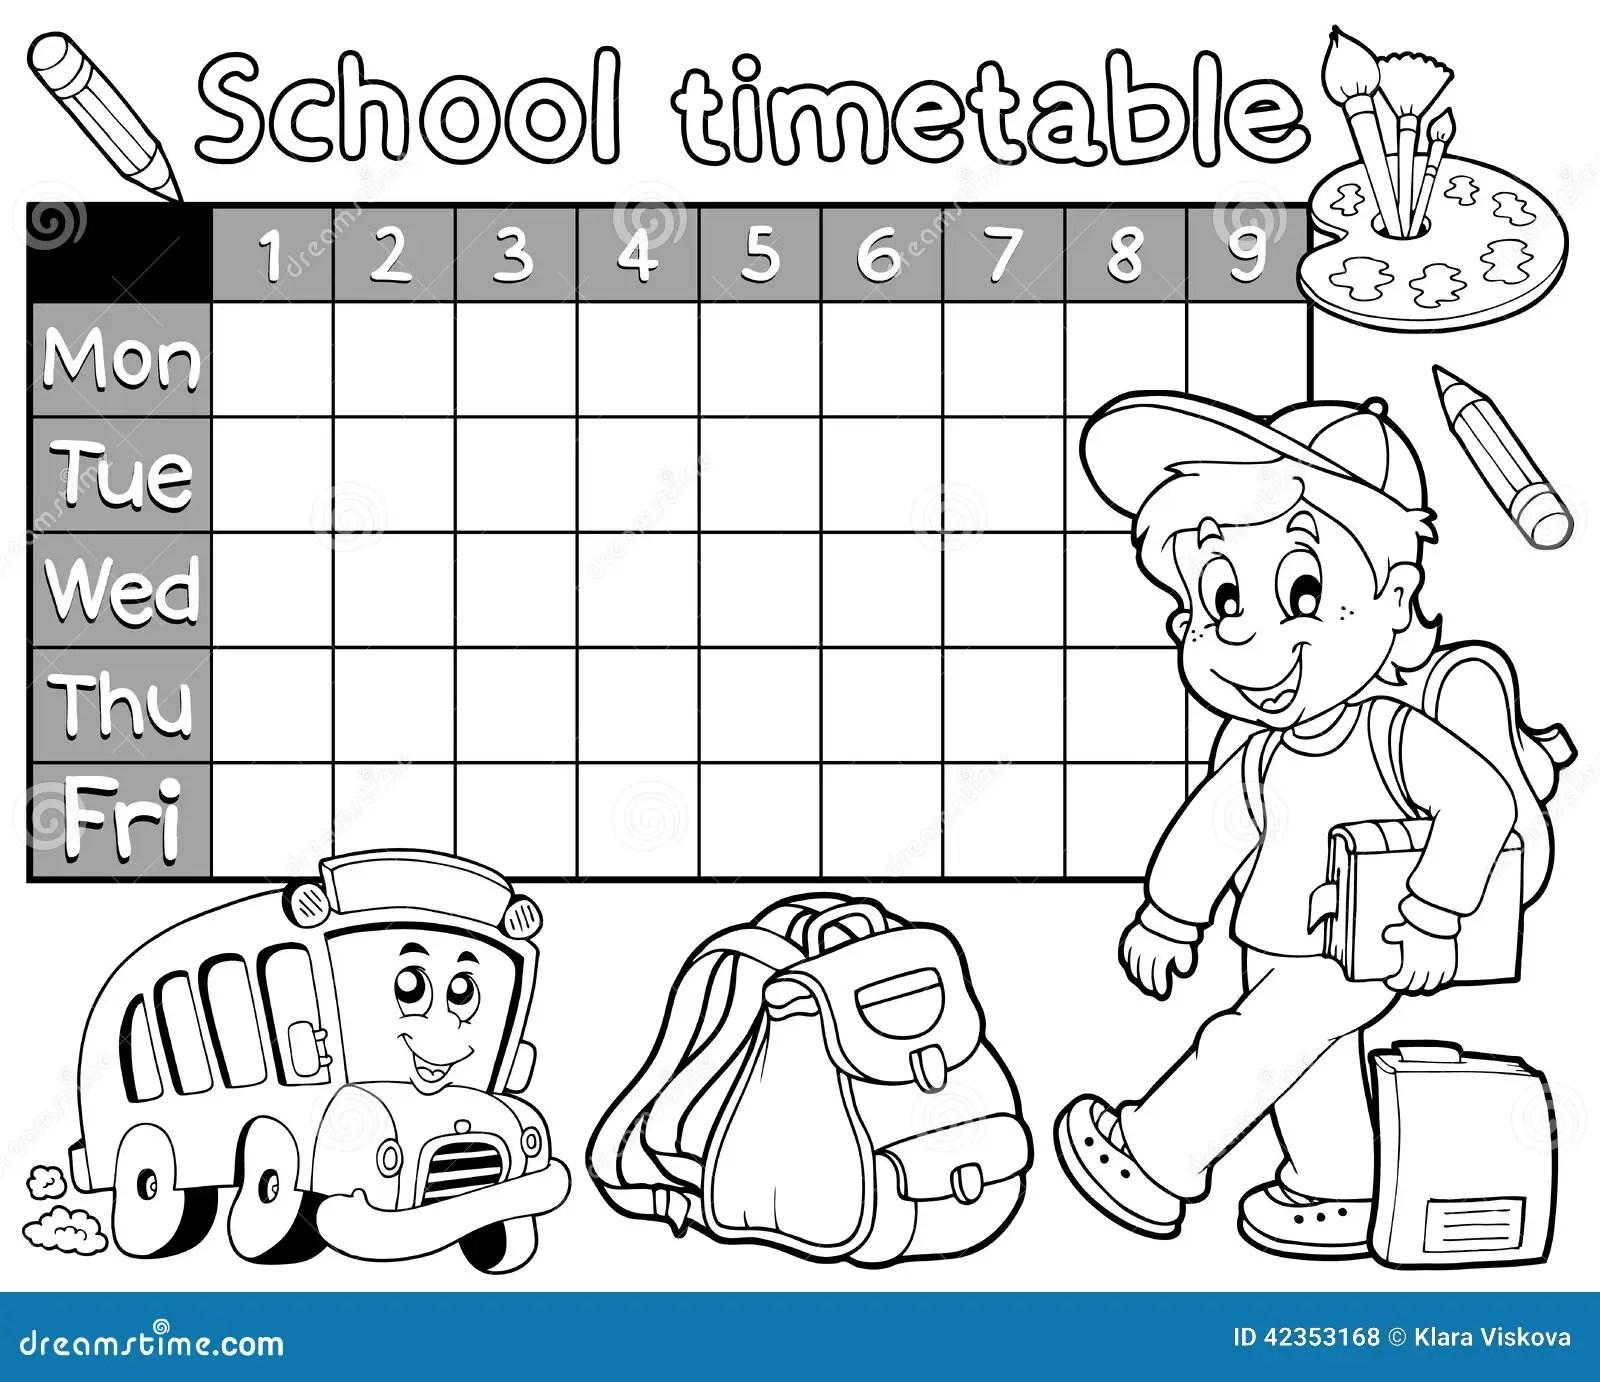 Coloring Book School Timetable 1 Stock Vector